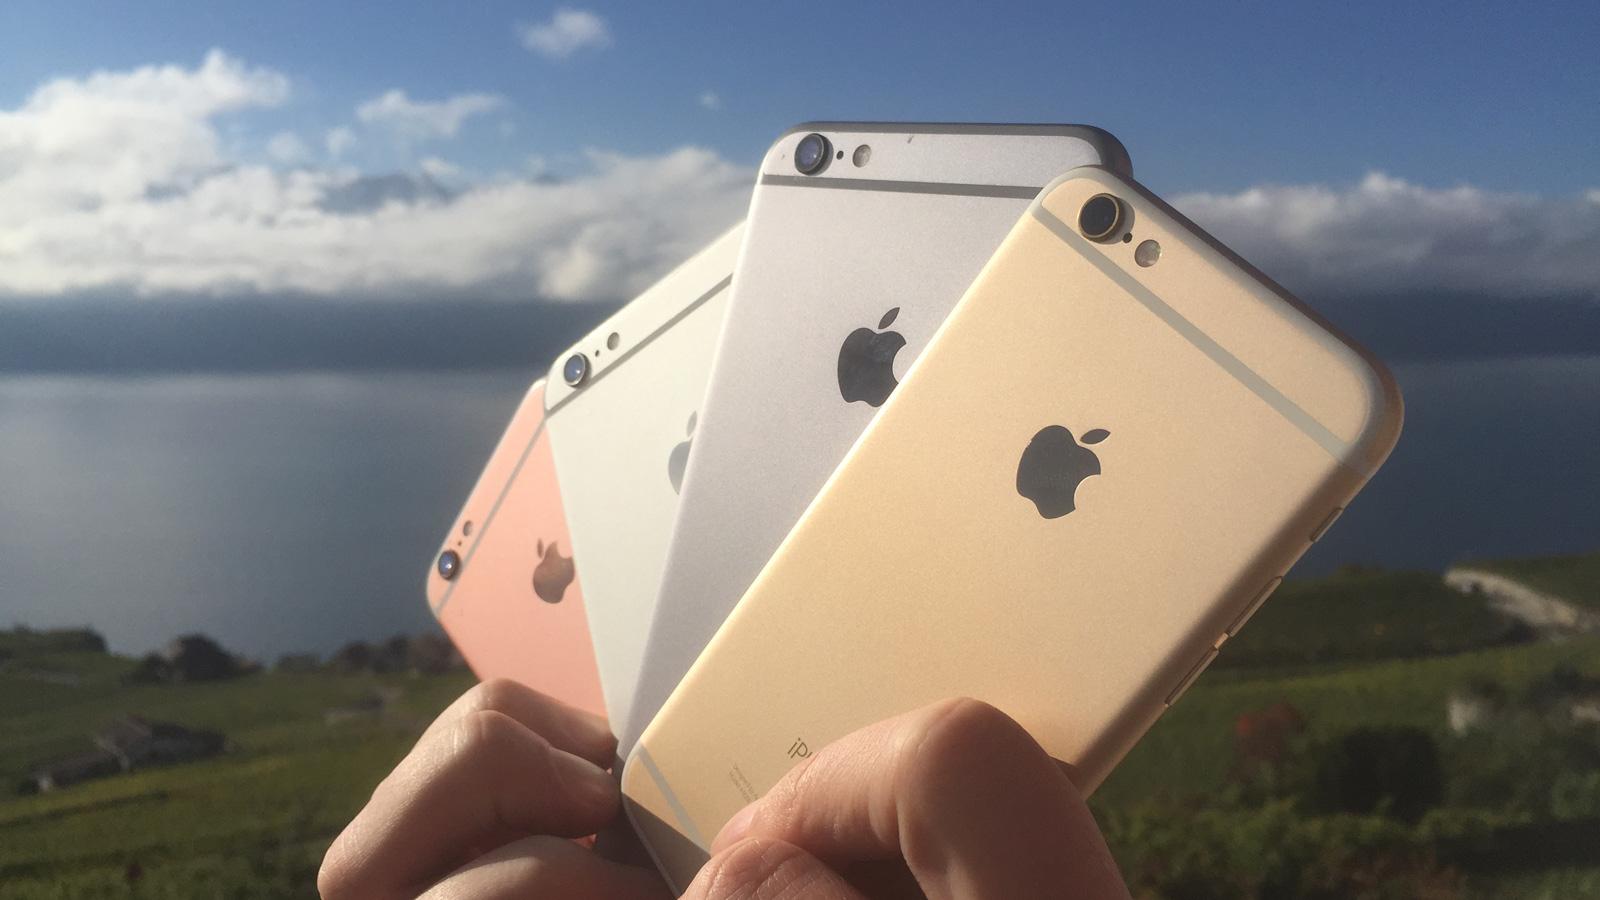 iPhone6scamerareview_switzerland.jpg